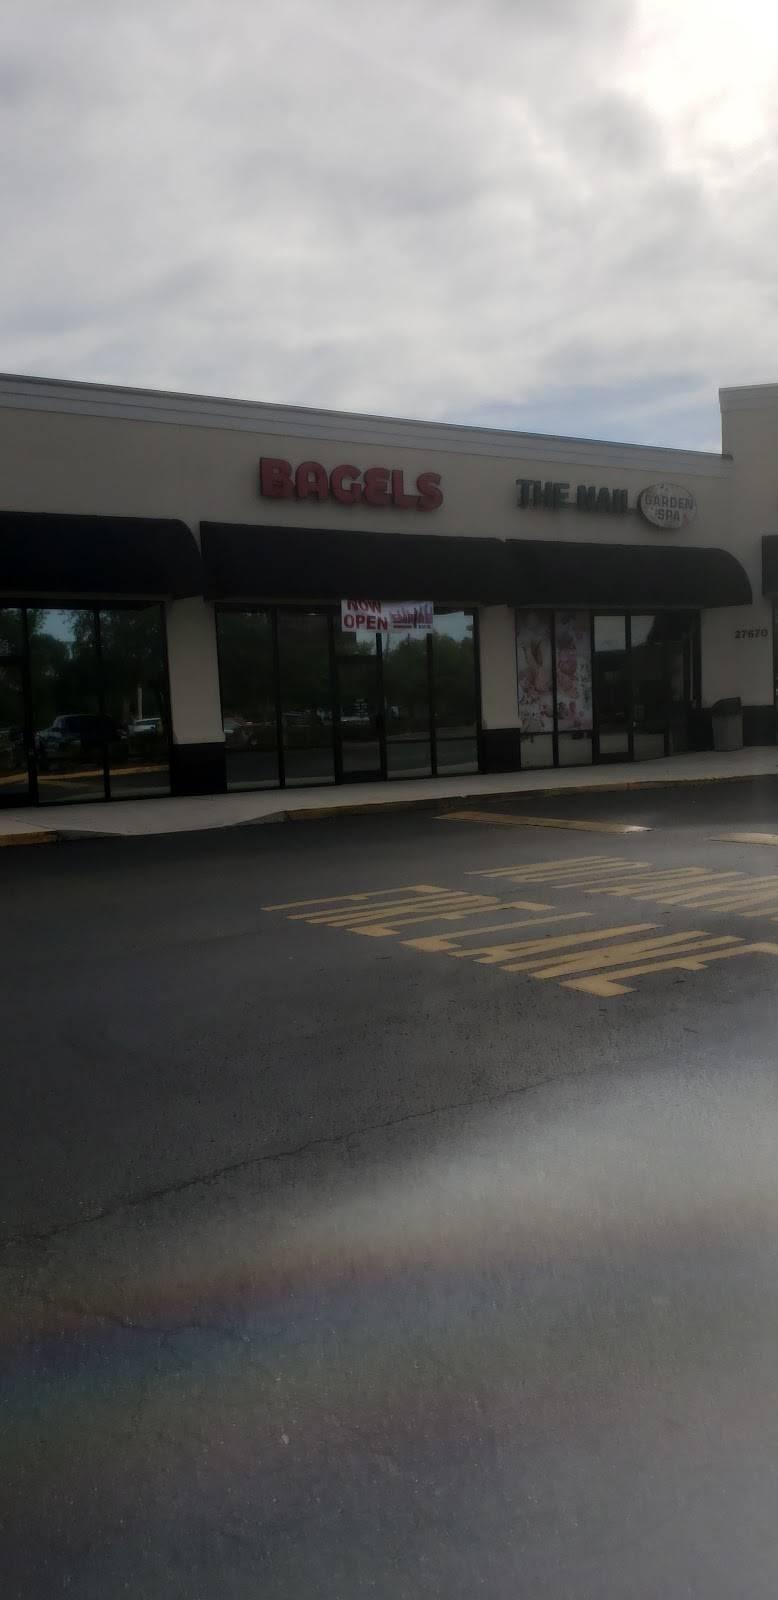 Empire Bagels | restaurant | Cleveland, FL 33982, USA | 9413478361 OR +1 941-347-8361